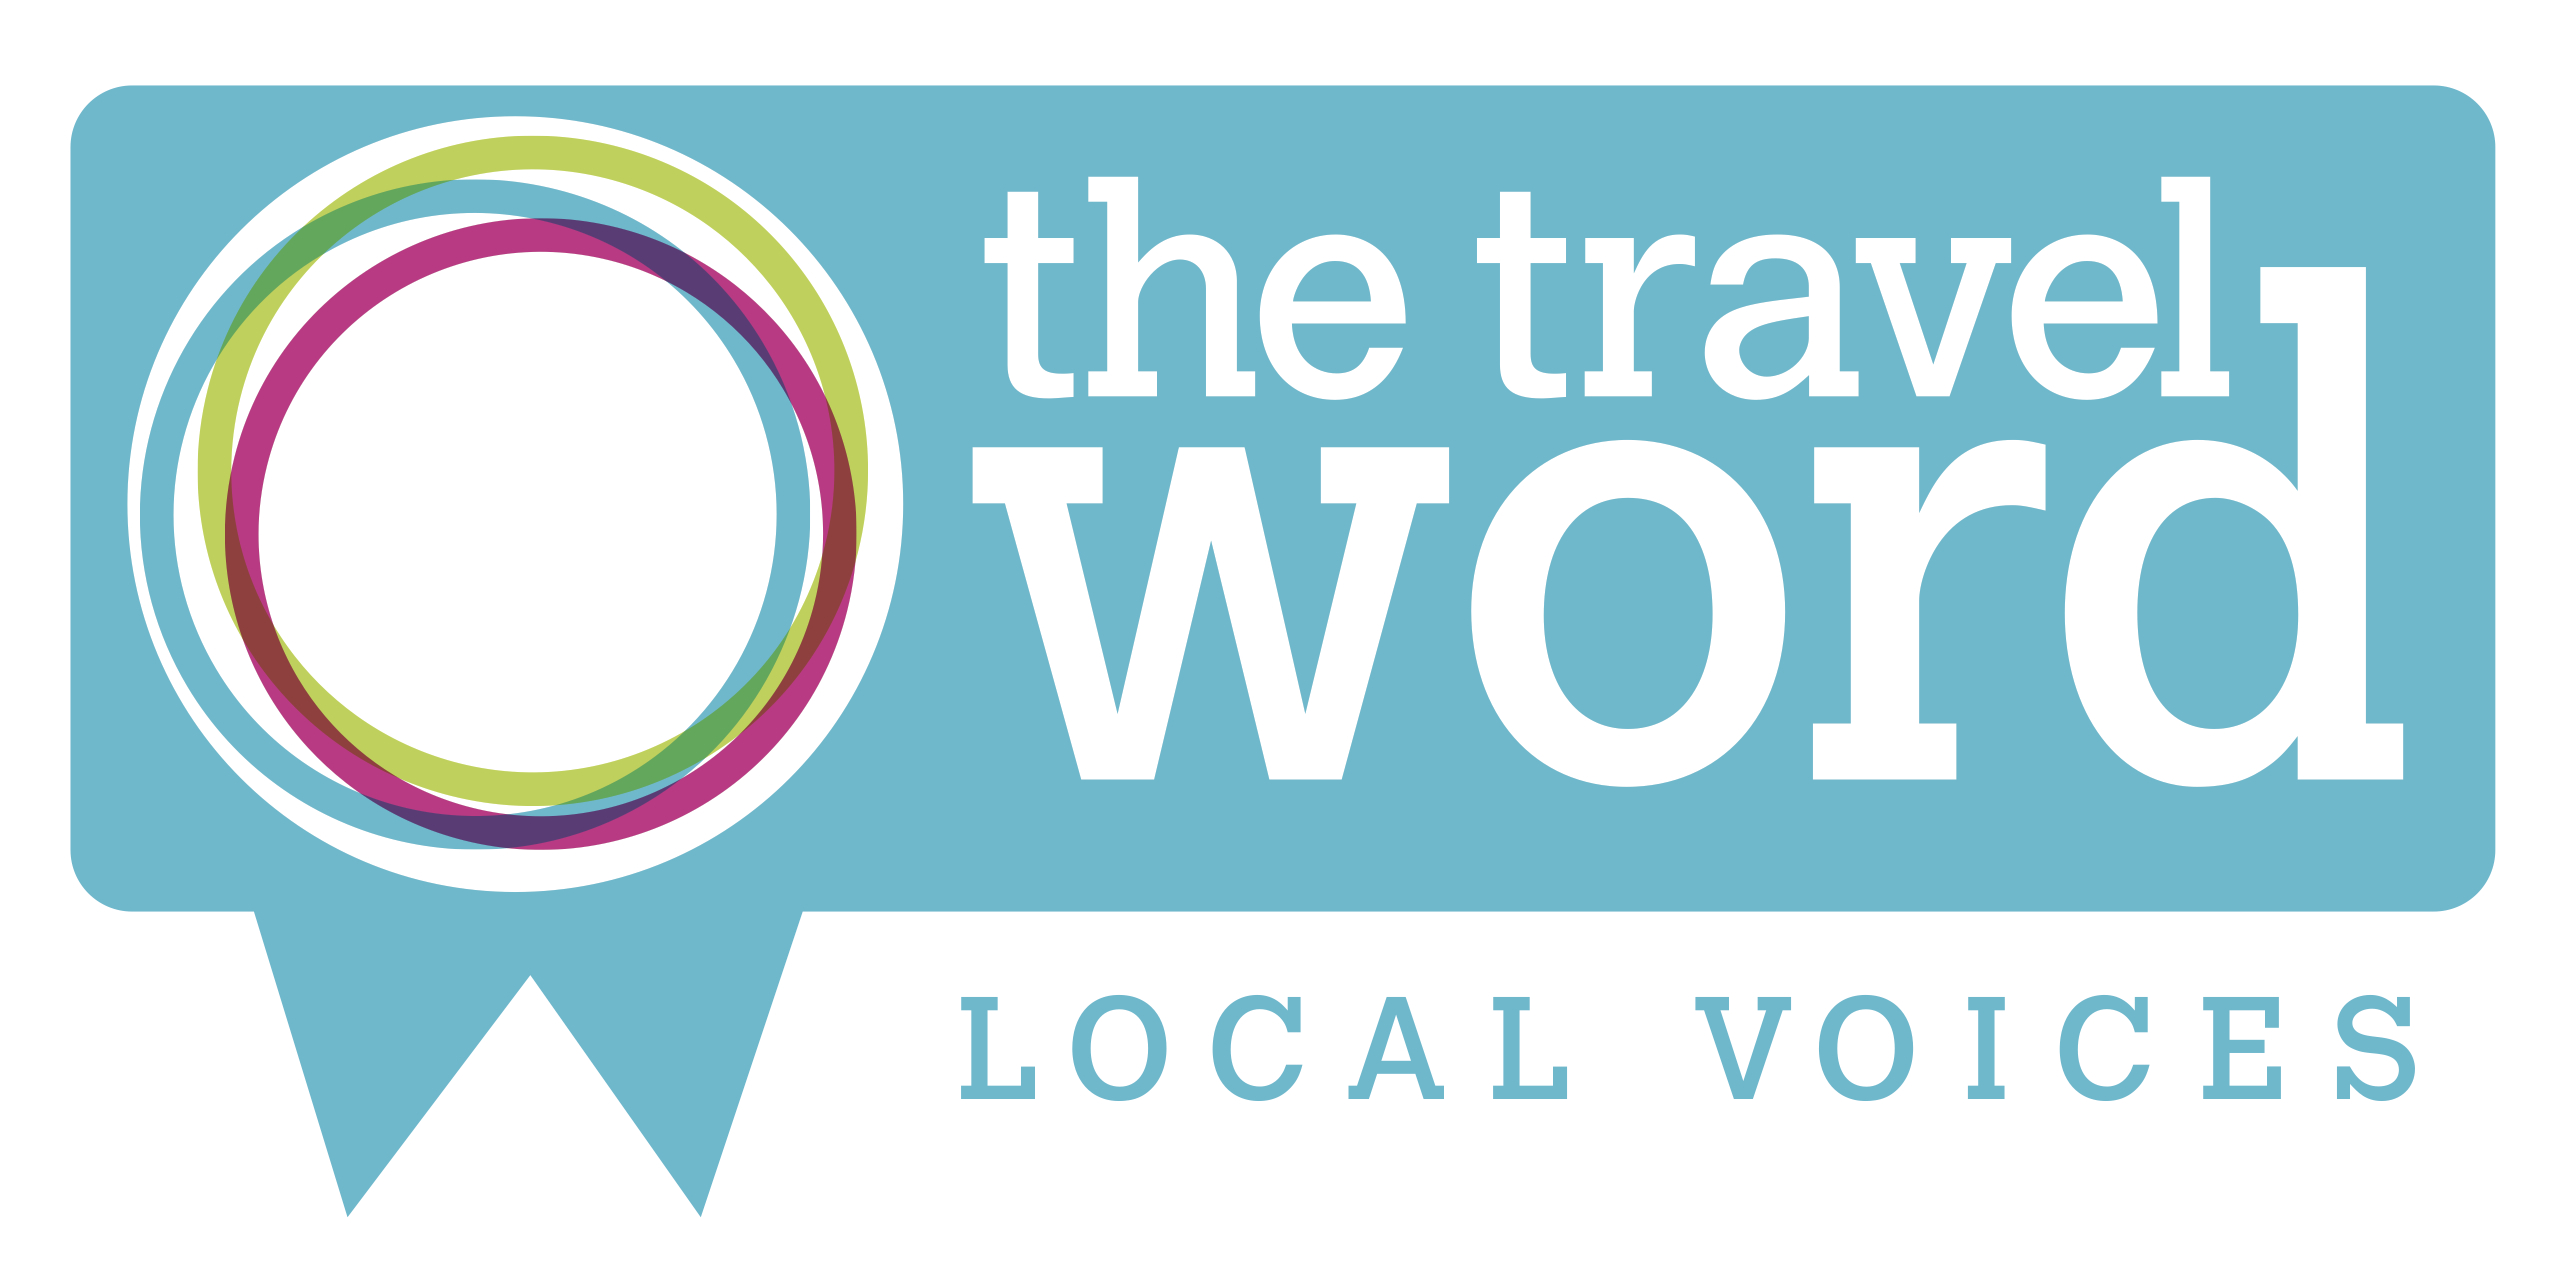 The Travel World: Ethan Gelber, USA